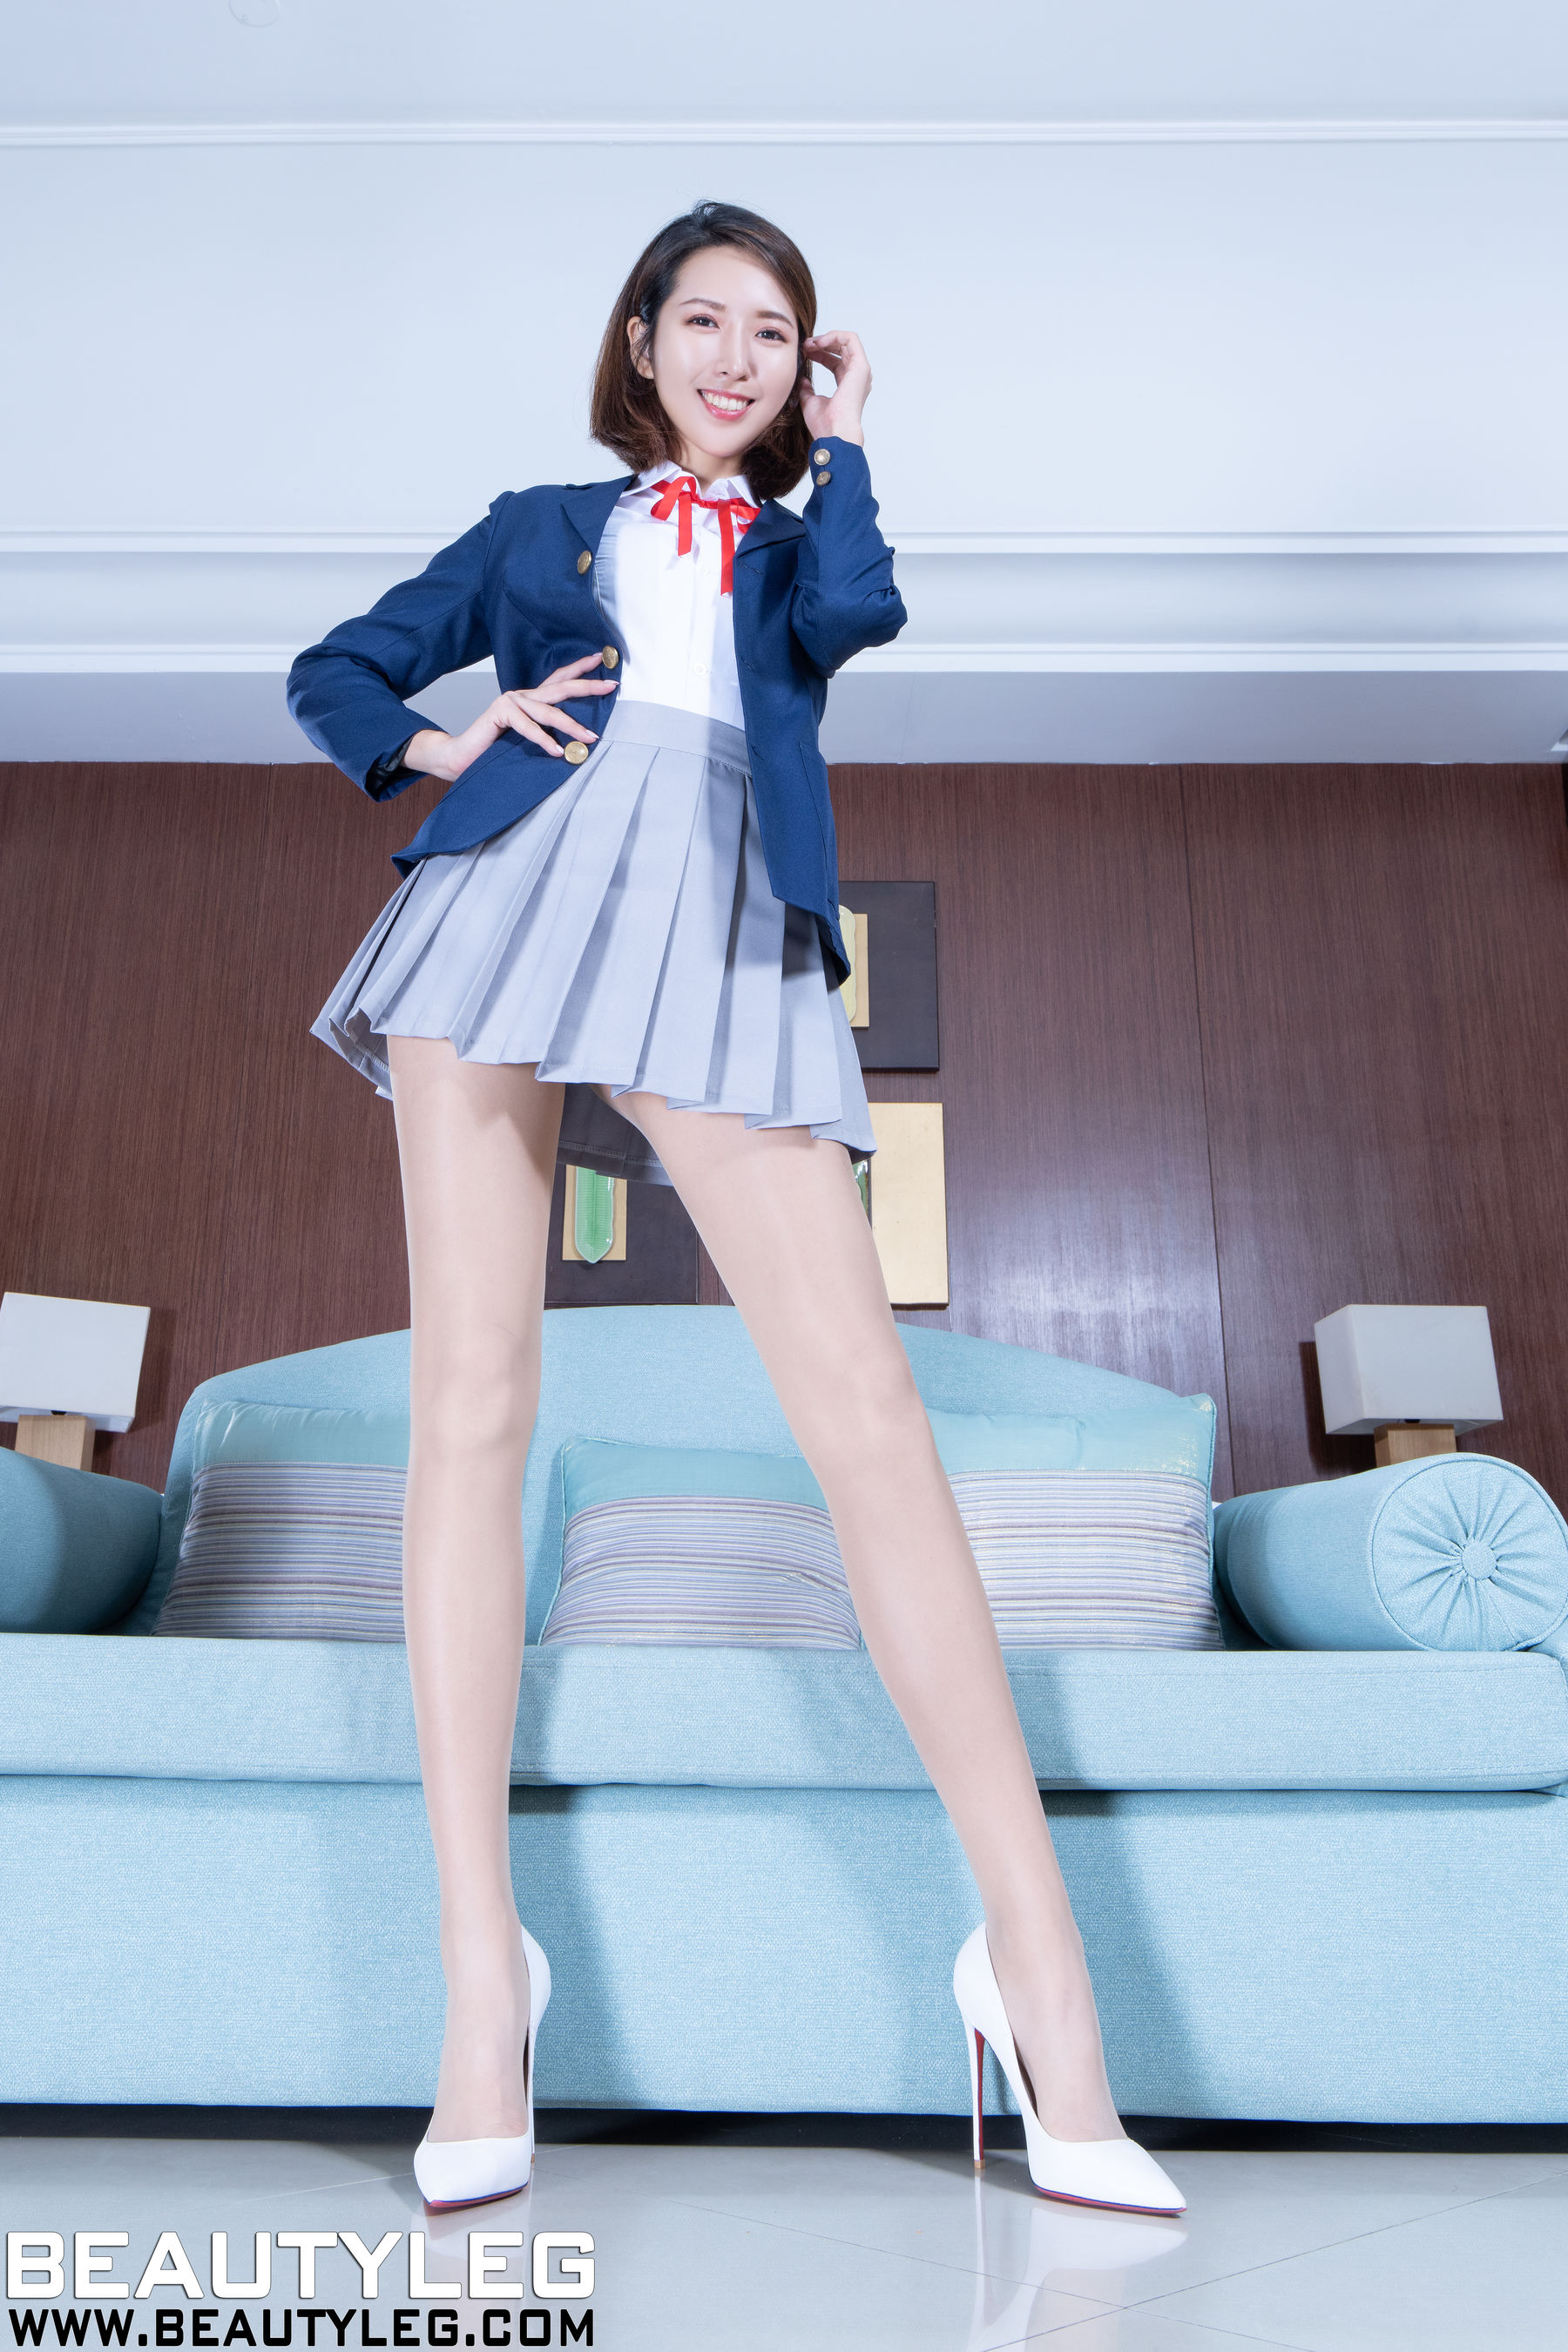 VOL.1209 [Beautyleg]丝袜制服:刘萱(腿模Iris)超高清个人性感漂亮大图(46P)